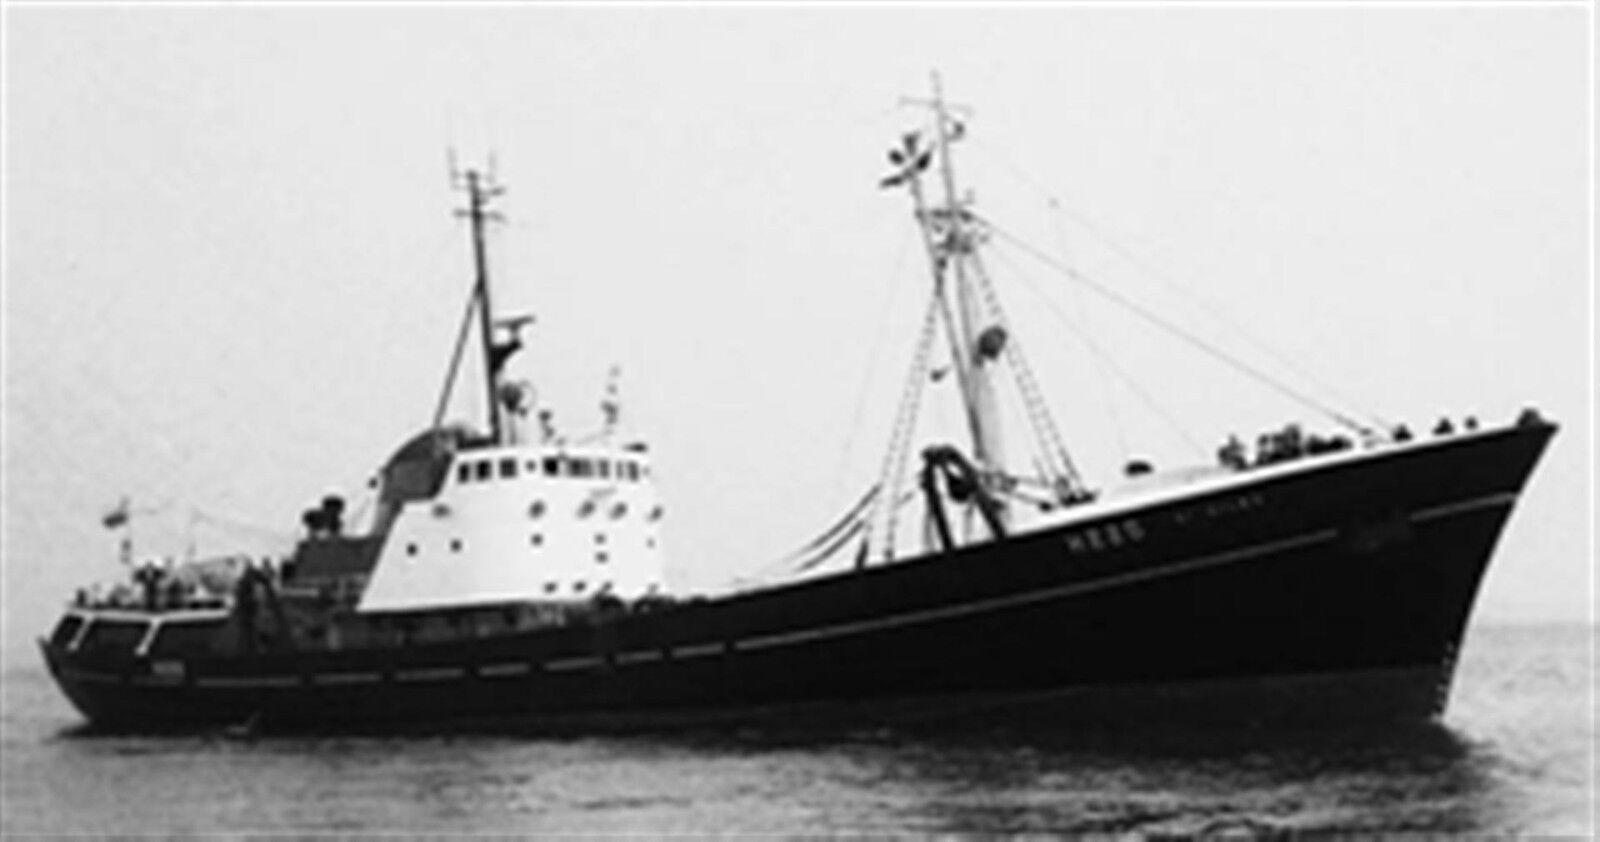 M.t. st. giles h 220 (sea shepherd ii).bauplan